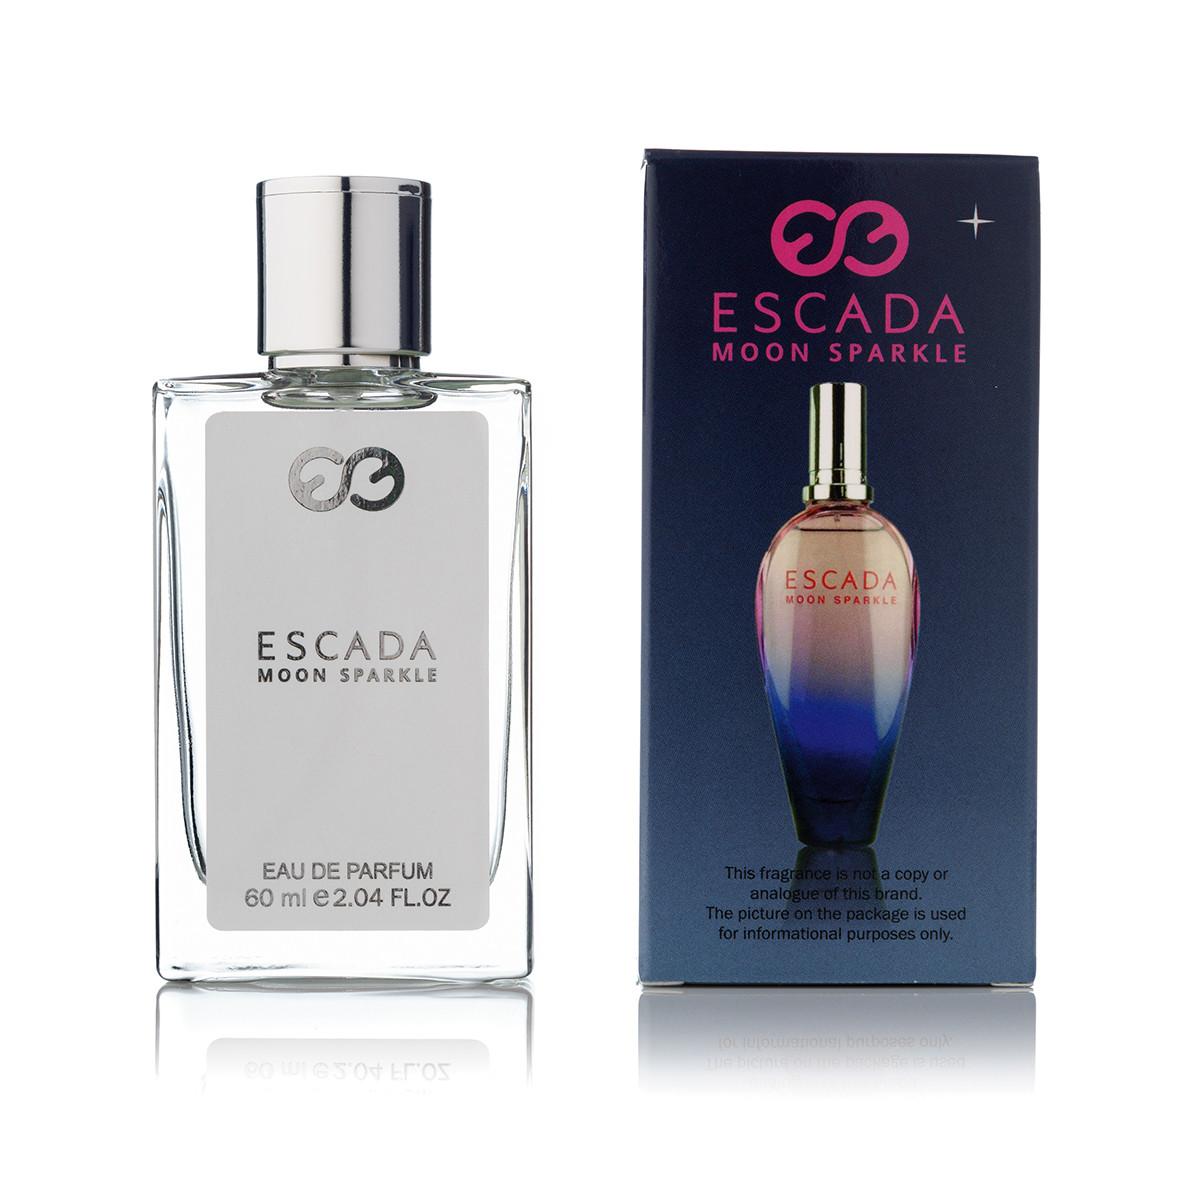 Мини-парфюм для женщин Escada Moon Sparkle - 60 мл